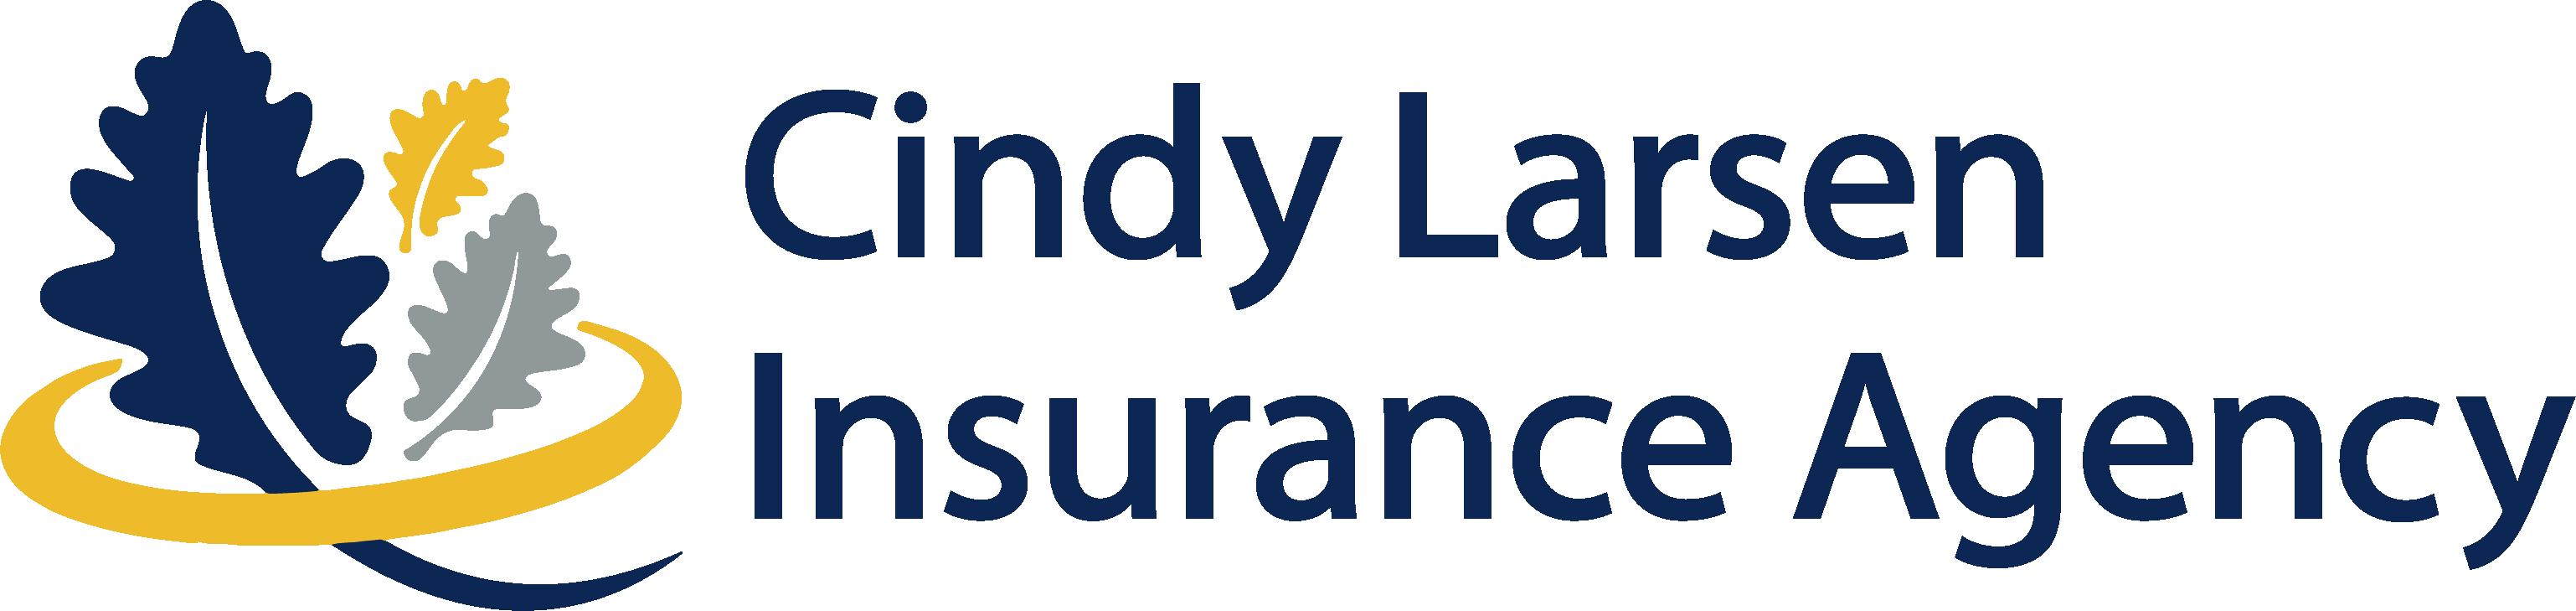 Cindy Larsen Insurance